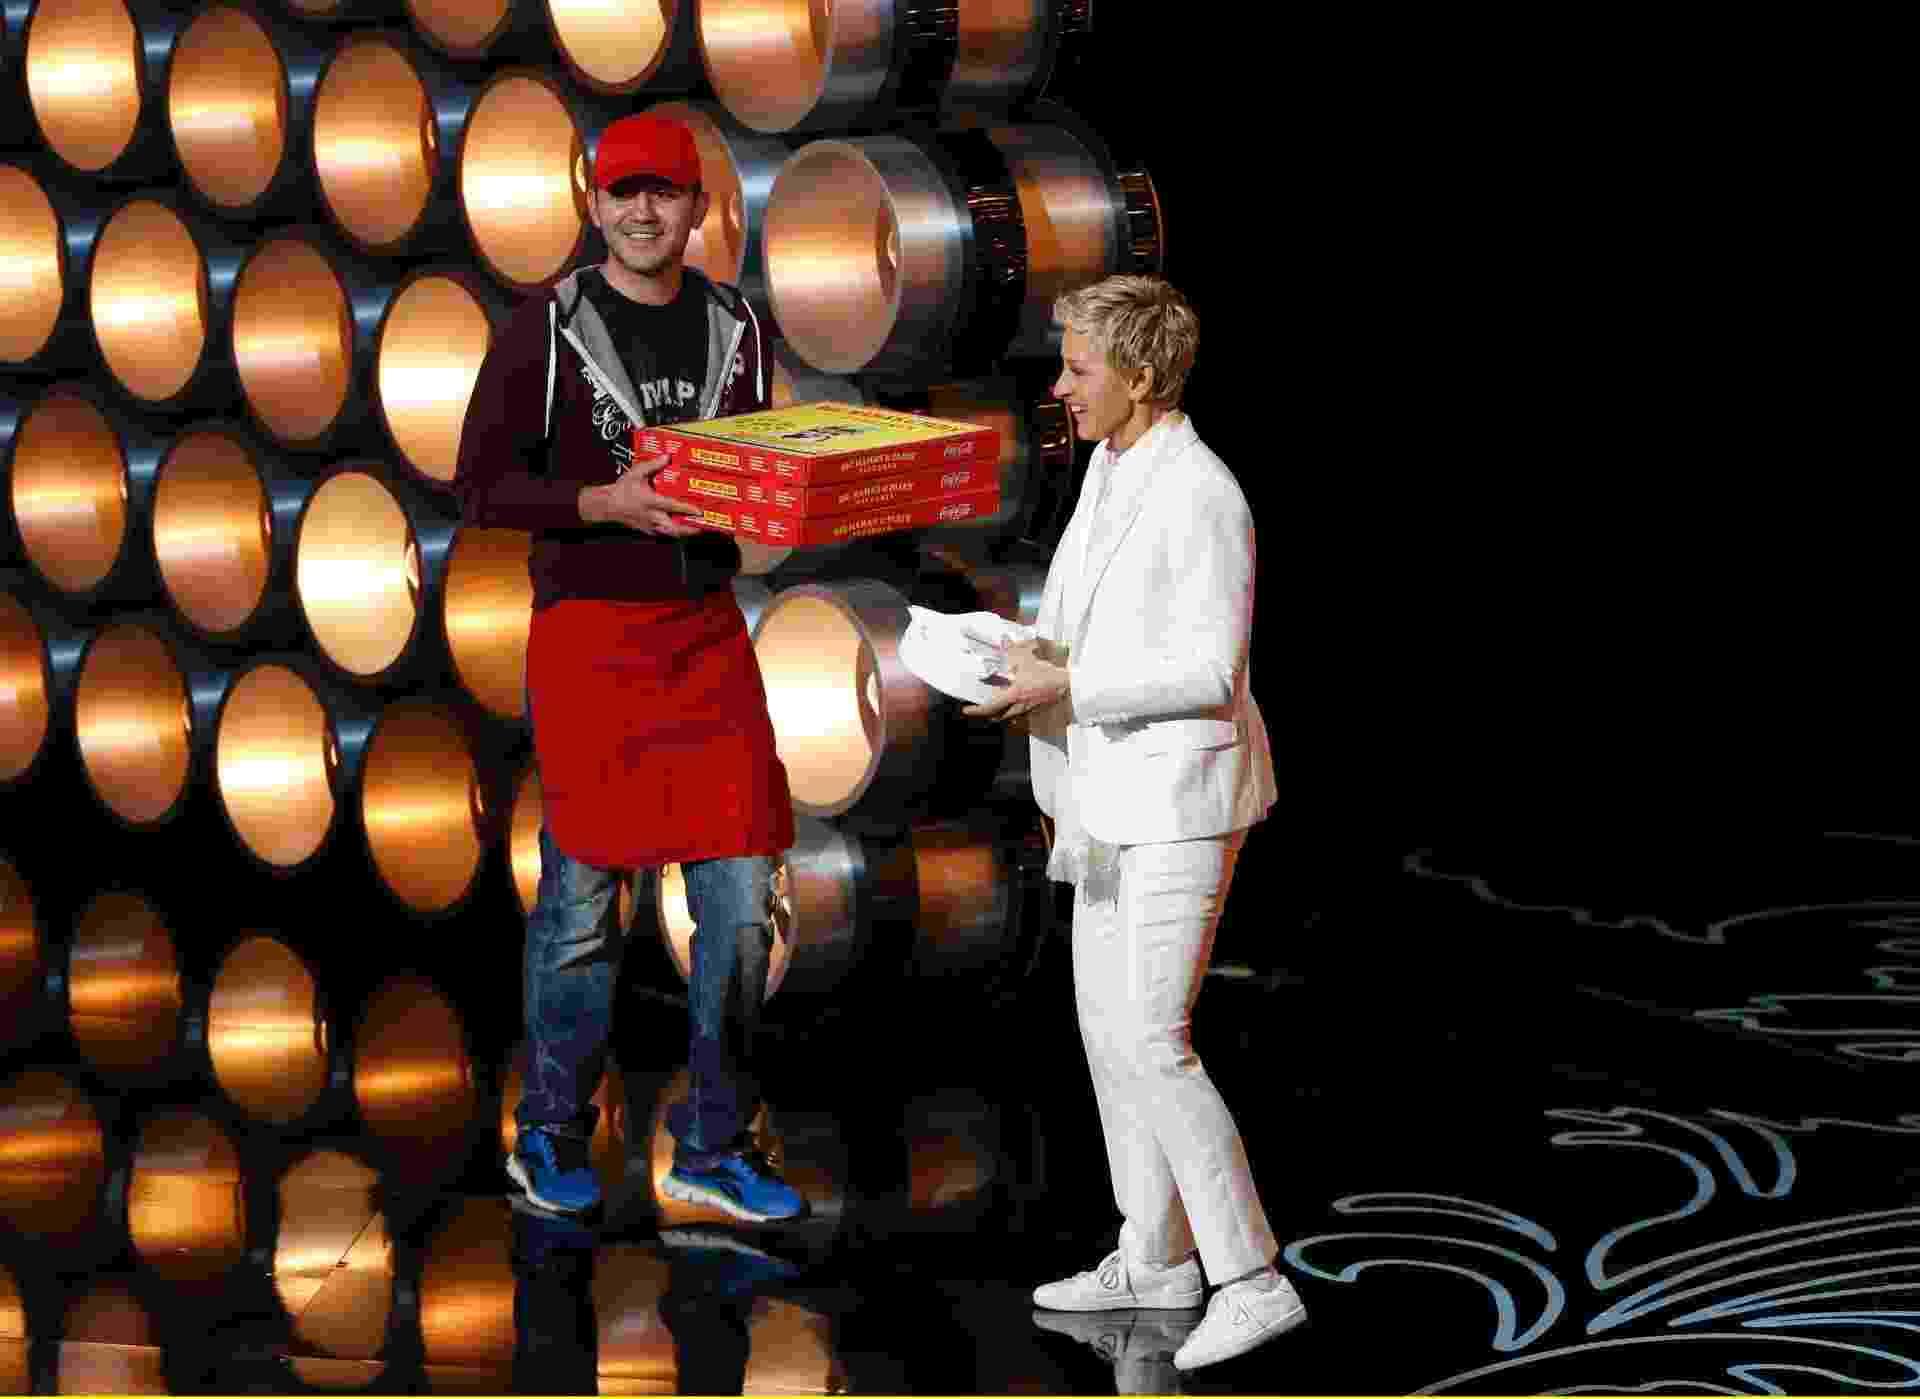 Apresentadora Ellen DeGeneres recebe pizzas durante Oscar 2014 - Lucy Nicholson/Reuters